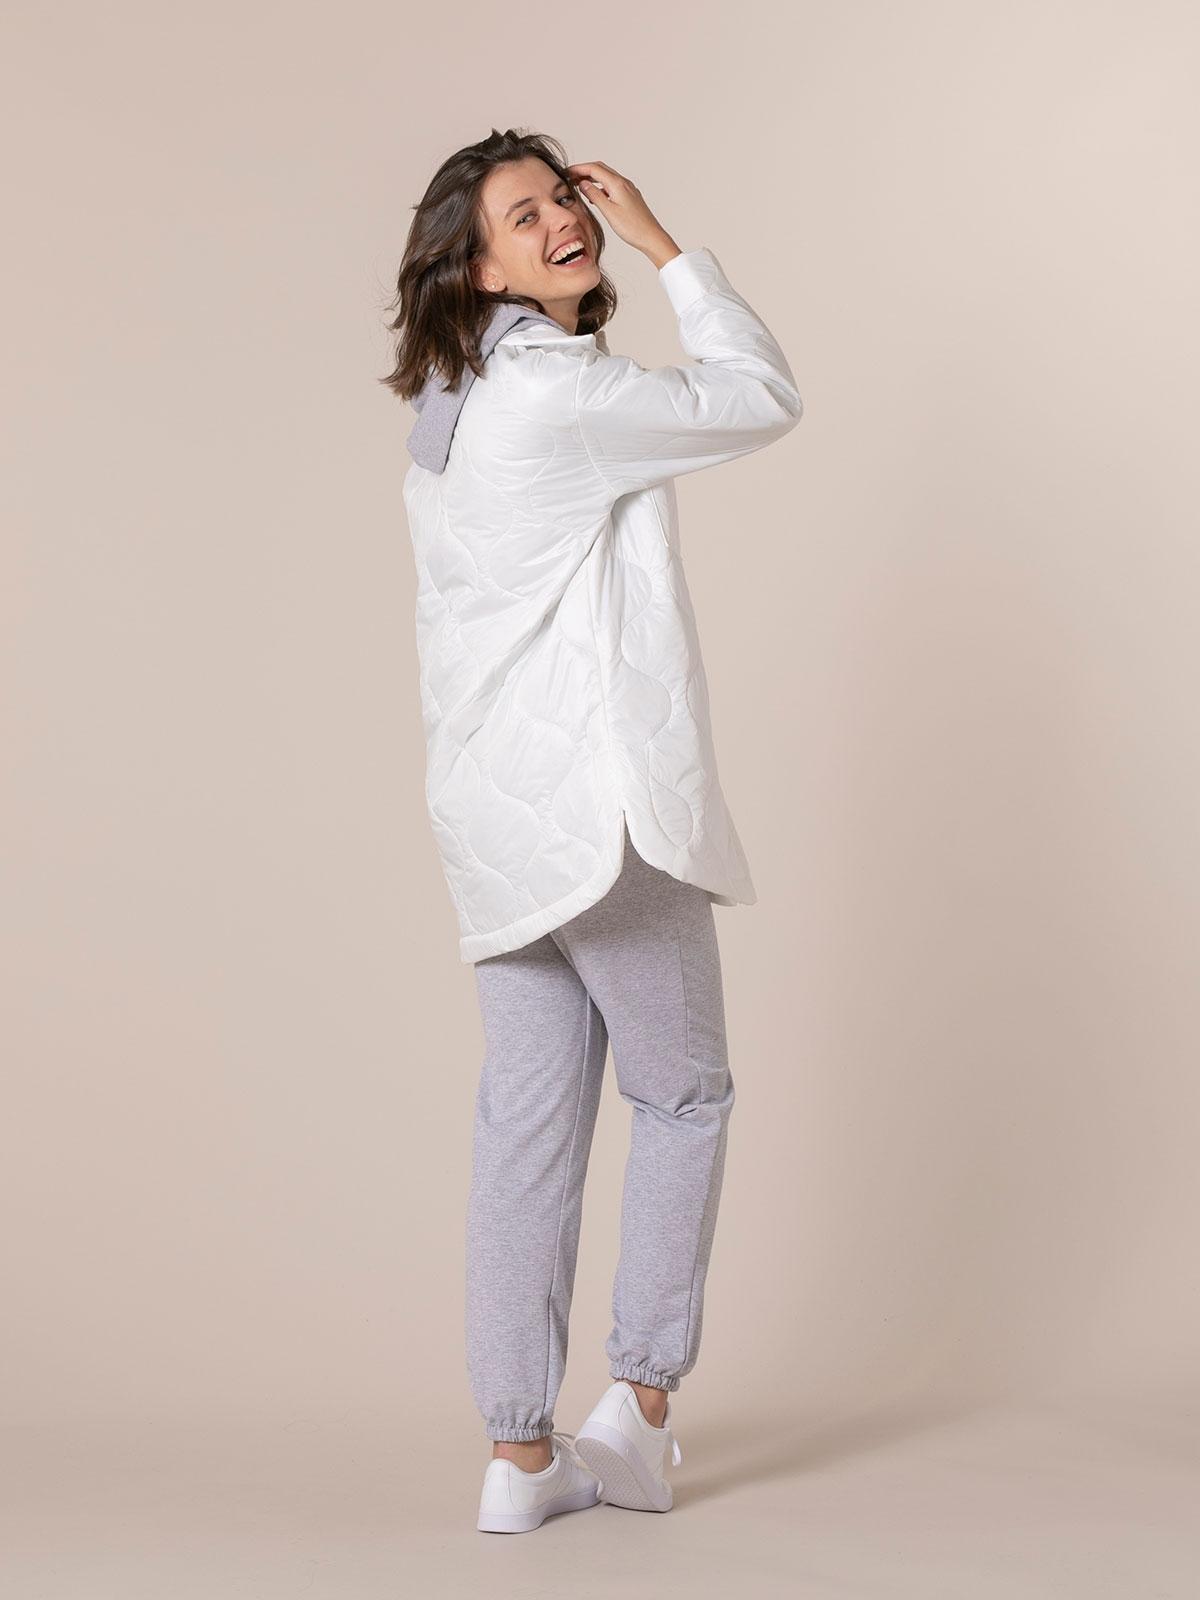 Parka mujer acolchada trendy Blanco